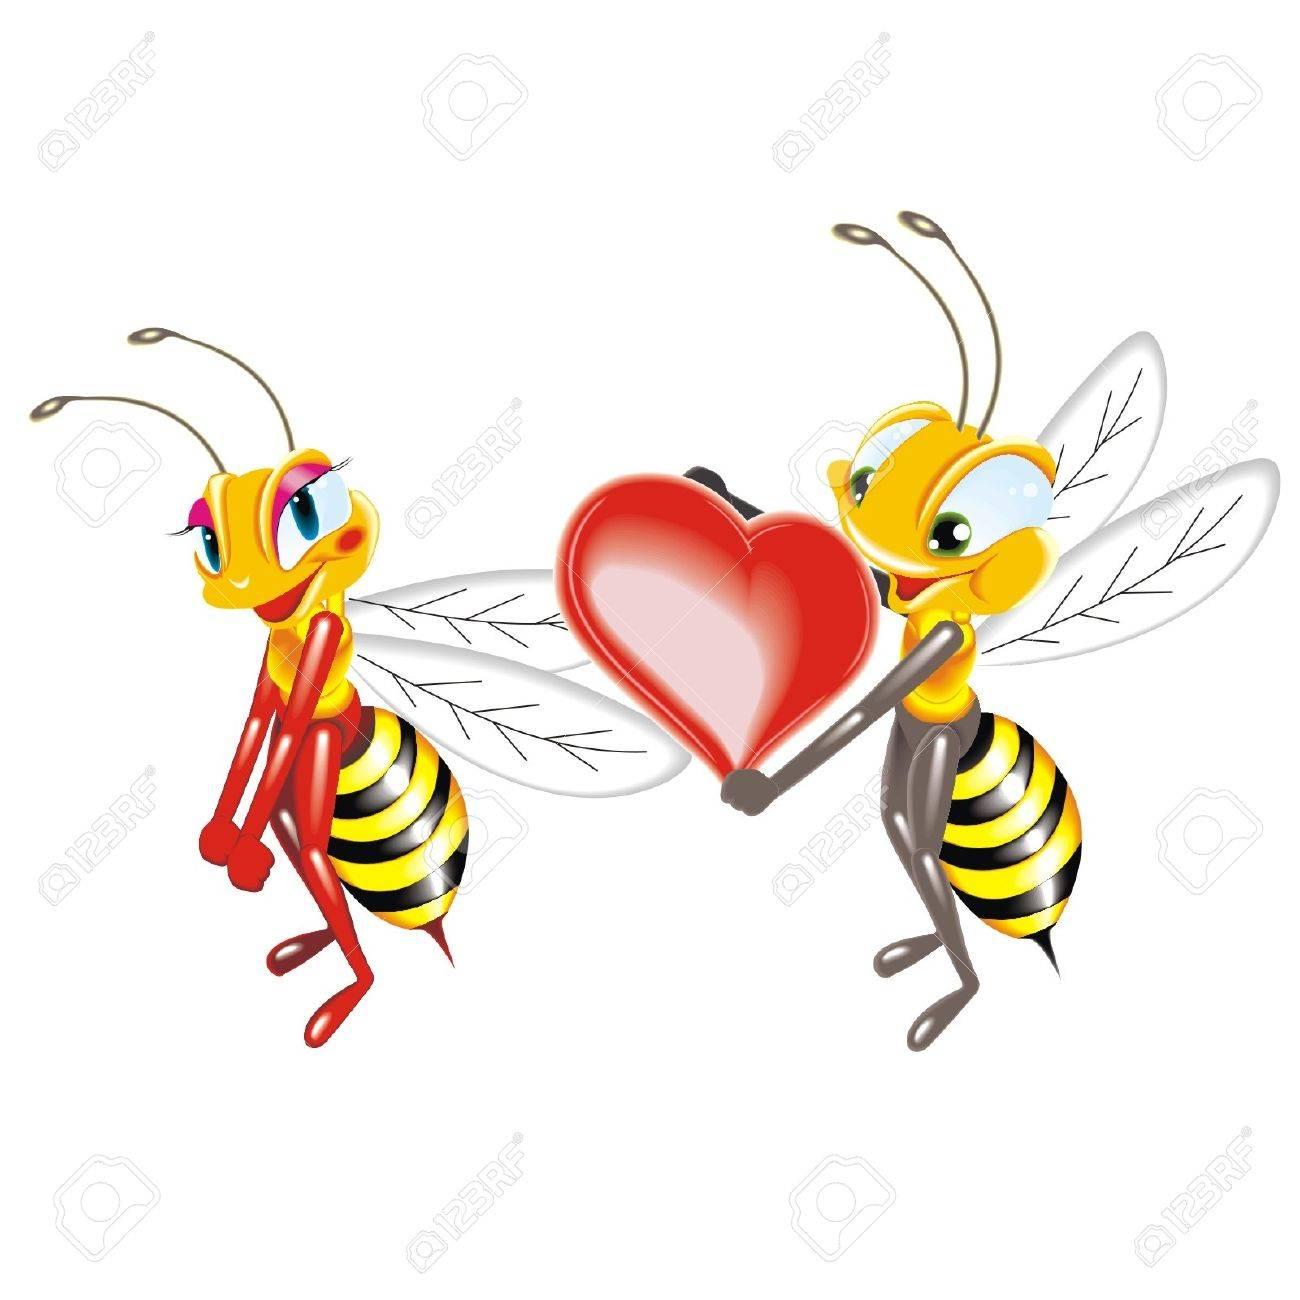 bees love - 21617022